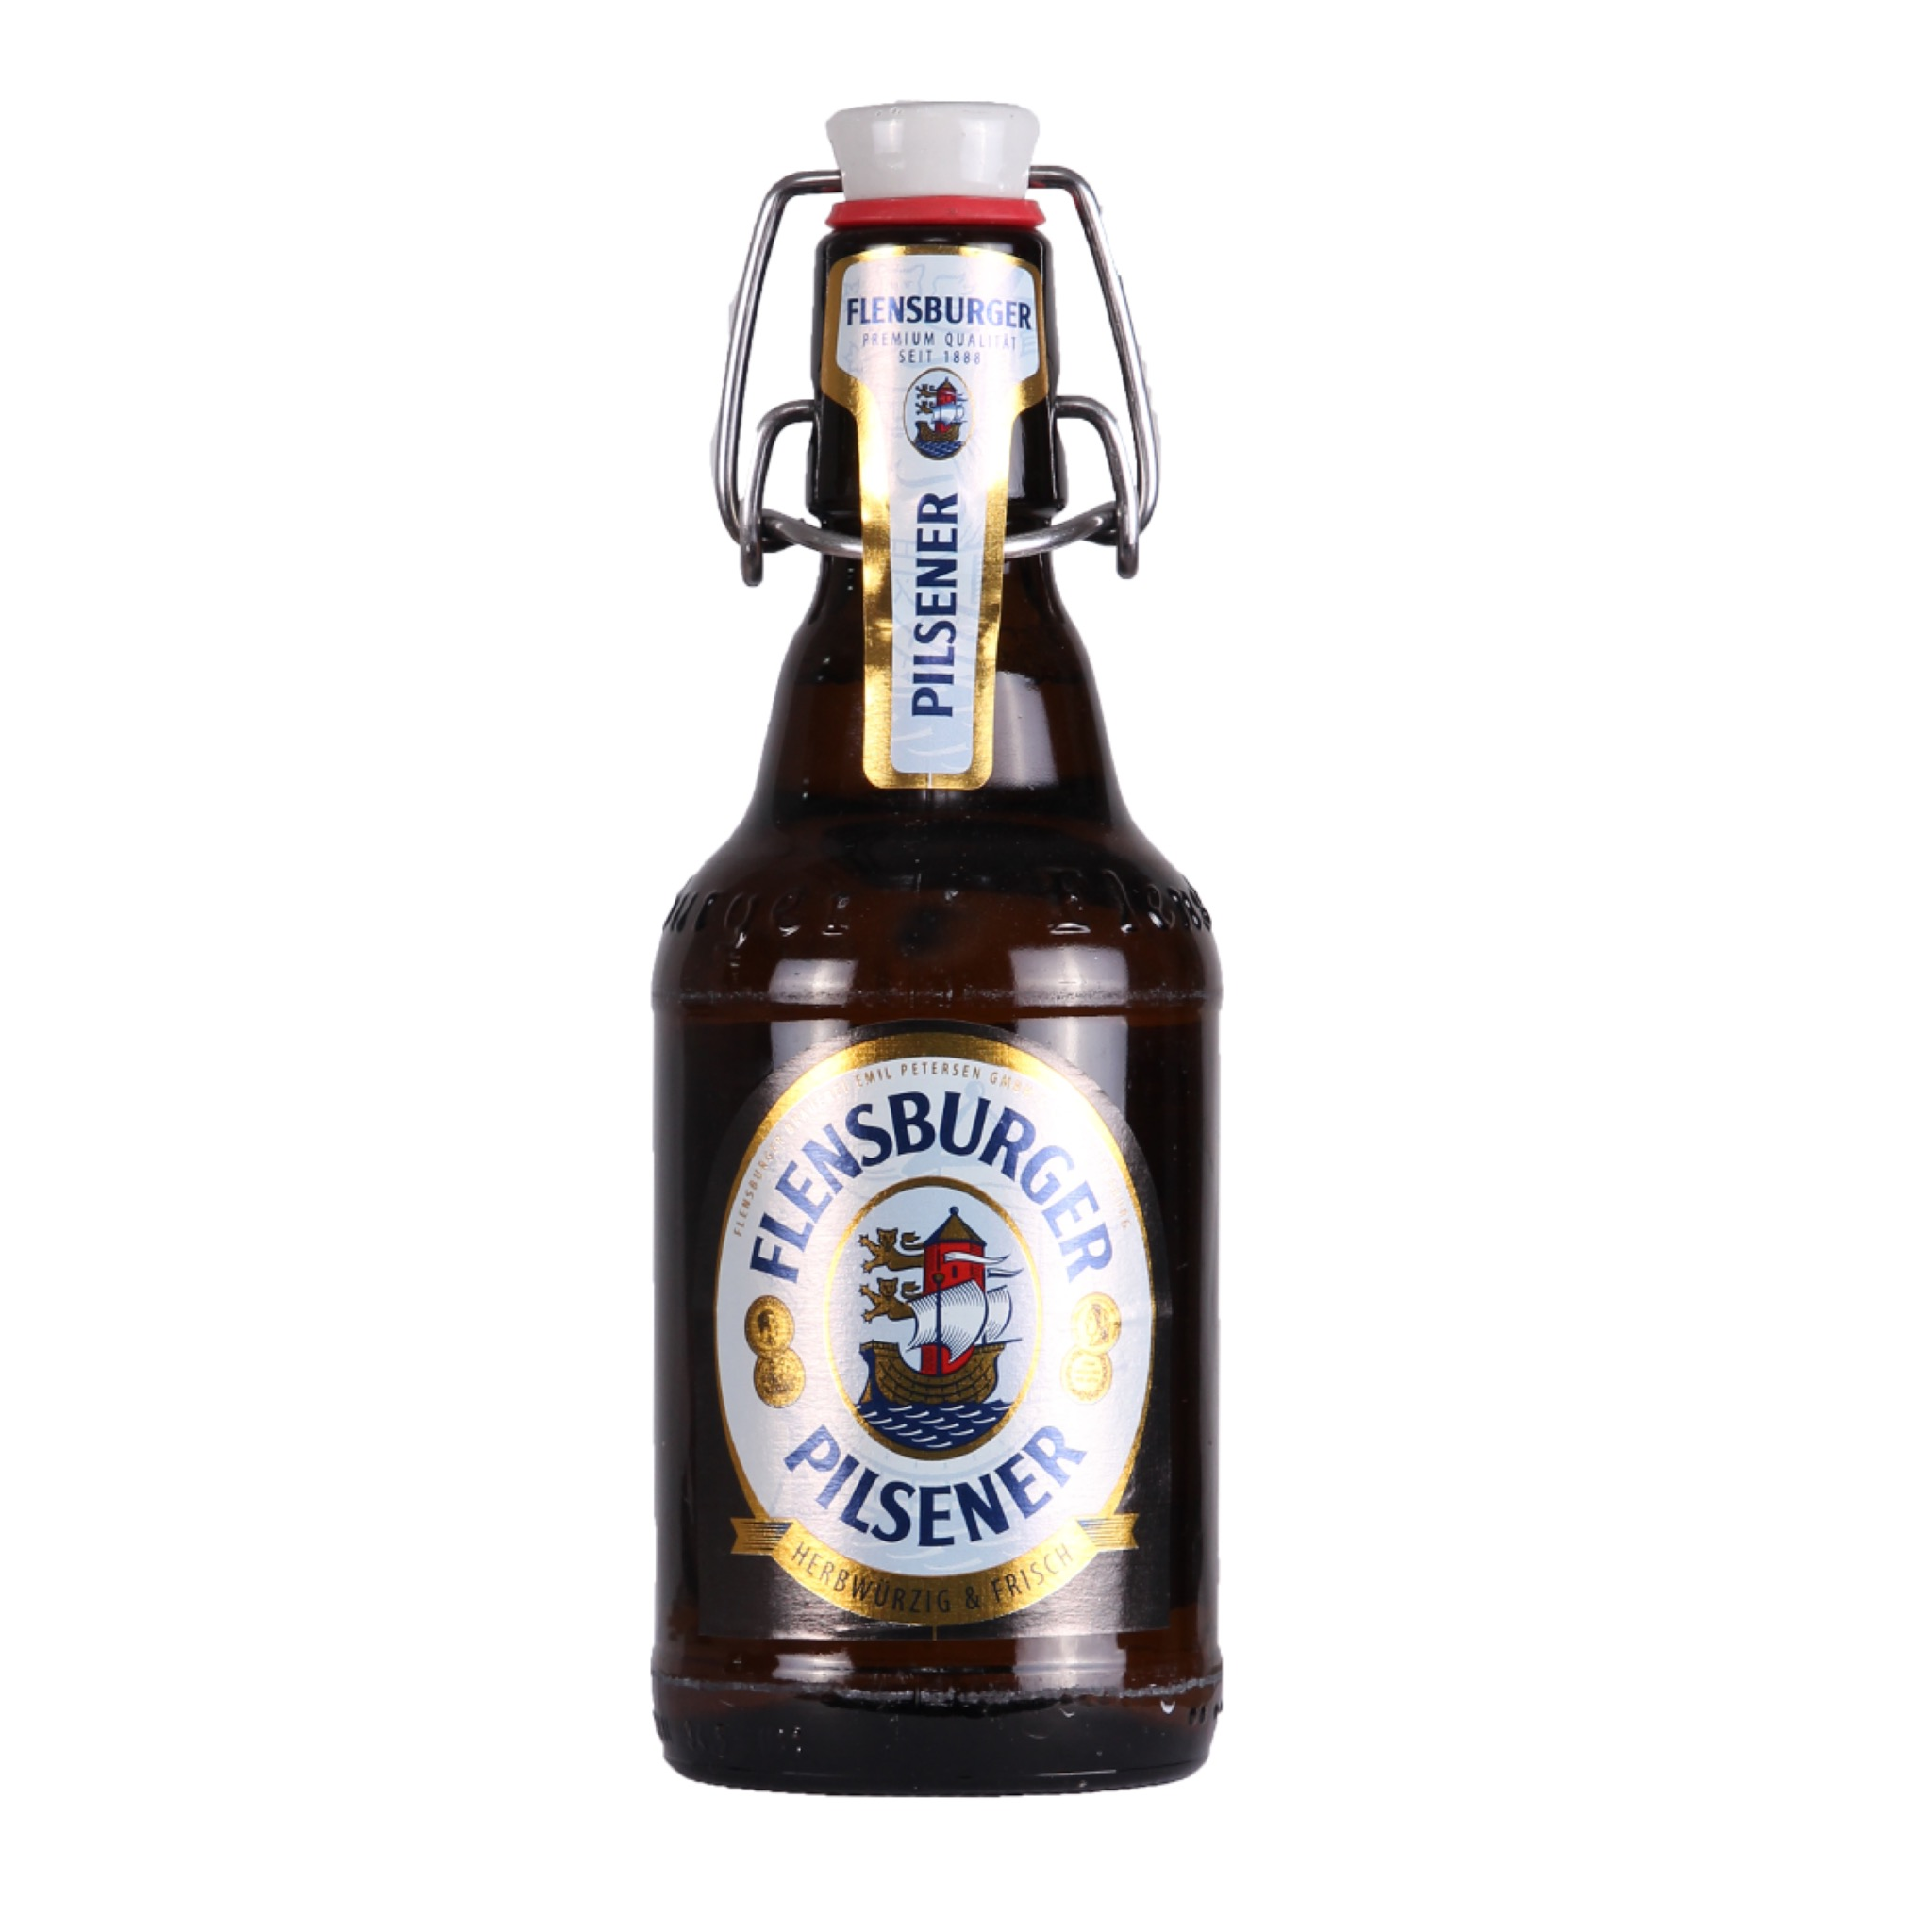 Flensburger Pilsner 4.8% 330ml